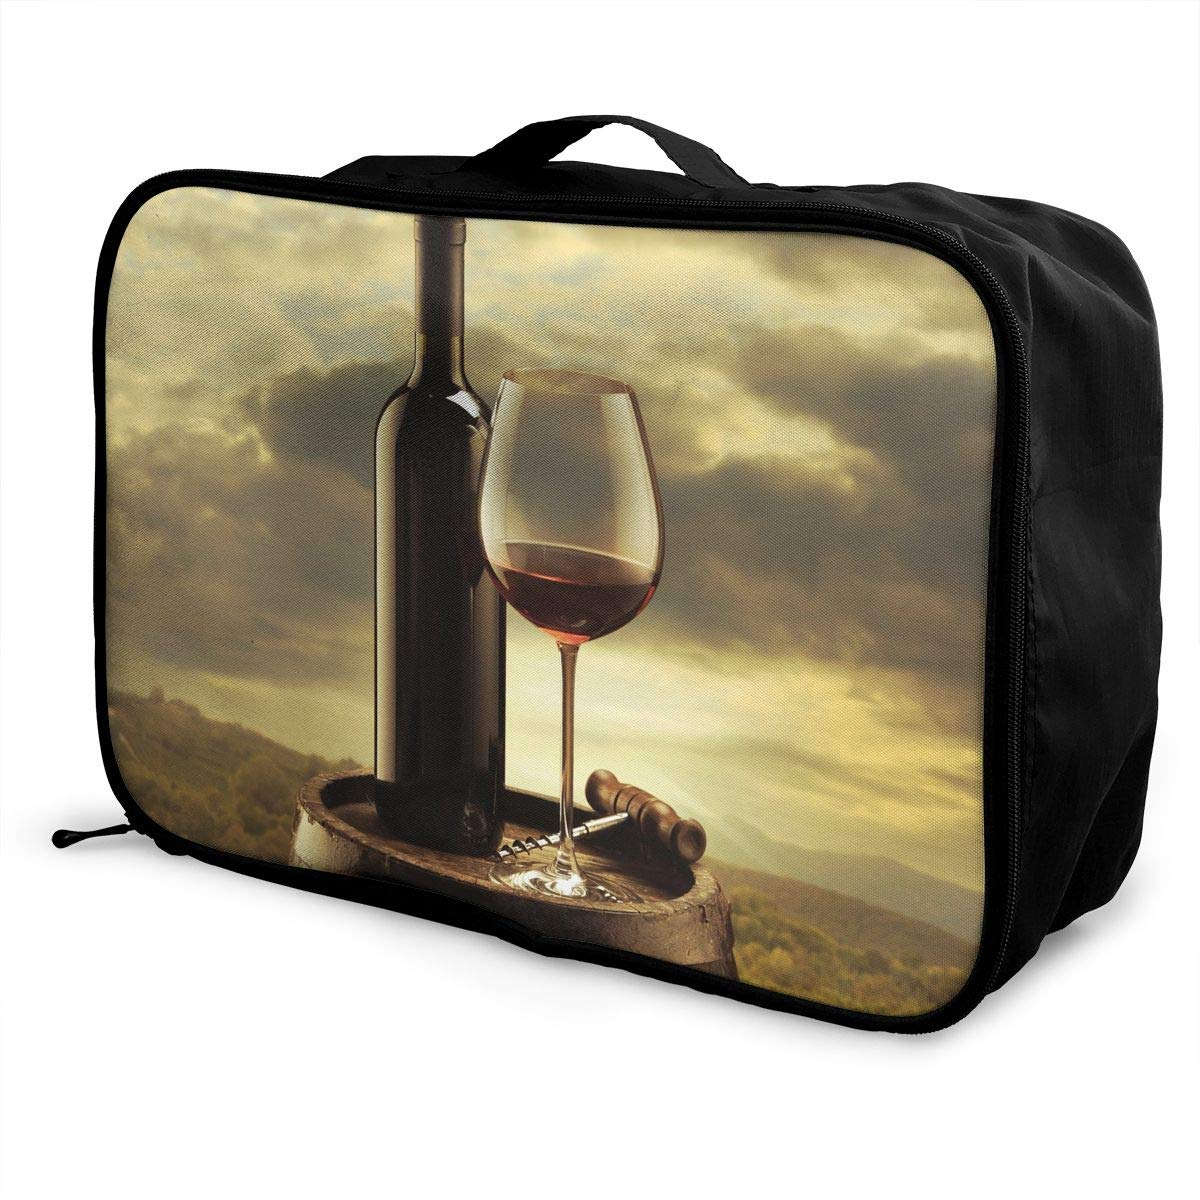 Travel Luggage Duffle Bag Lightweight Portable Handbag Wine Bottle Large Capacity Waterproof Foldable Storage Tote